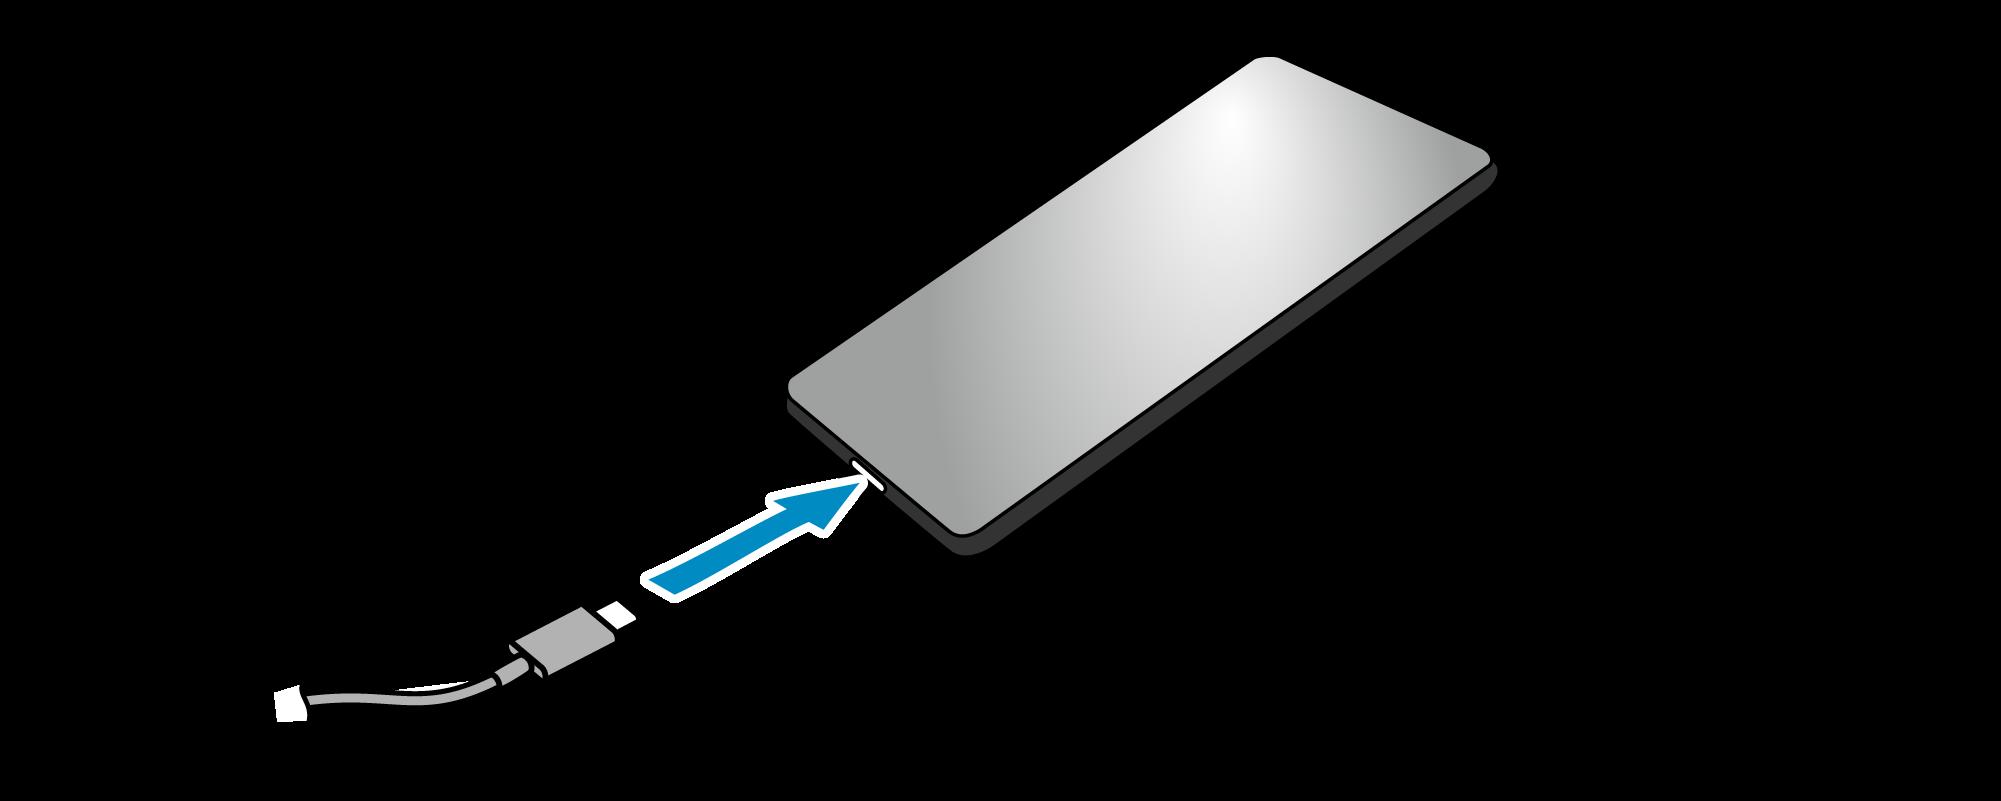 Connect USB Cable: TSP100IIIU Online Manual